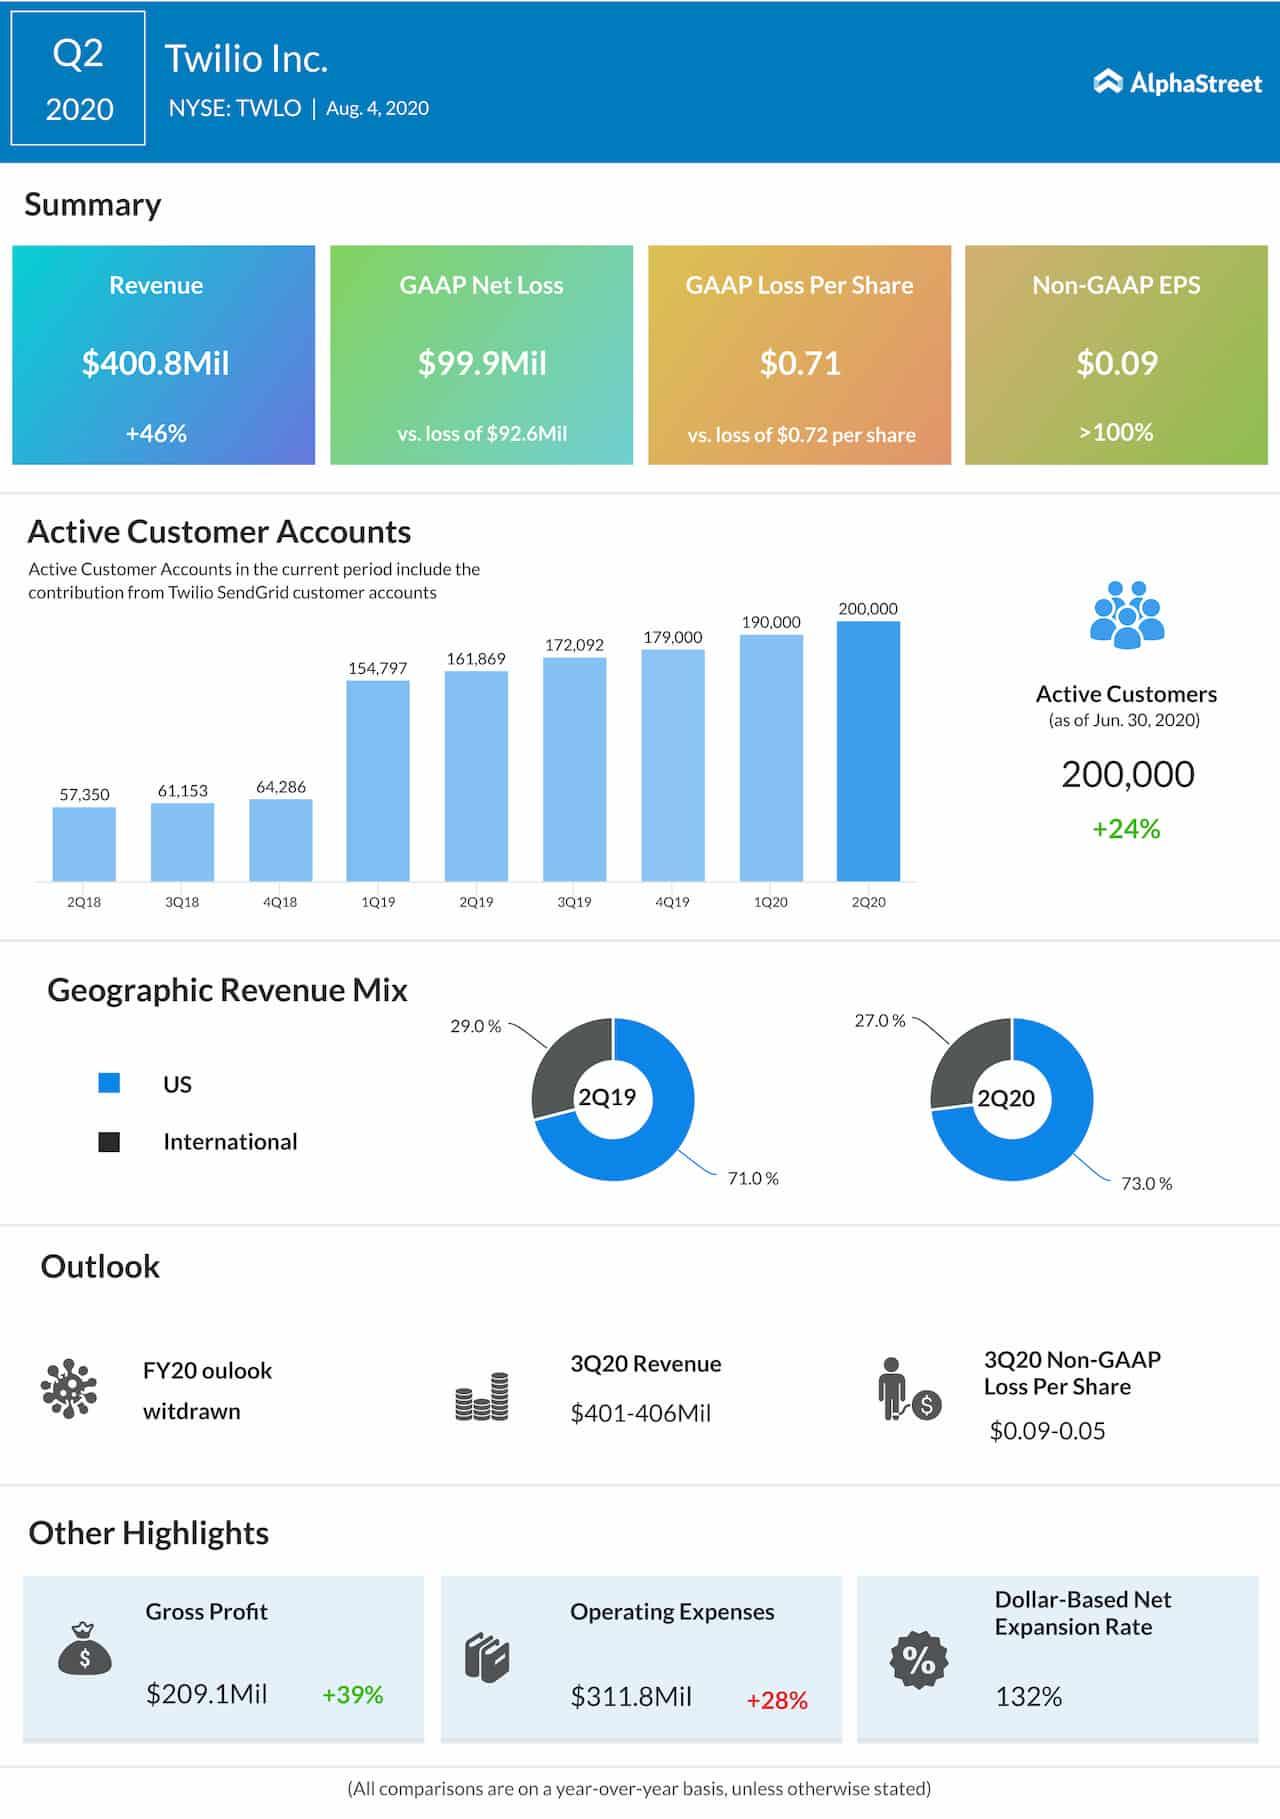 Twilio Q2 2020 Earnings Infographic